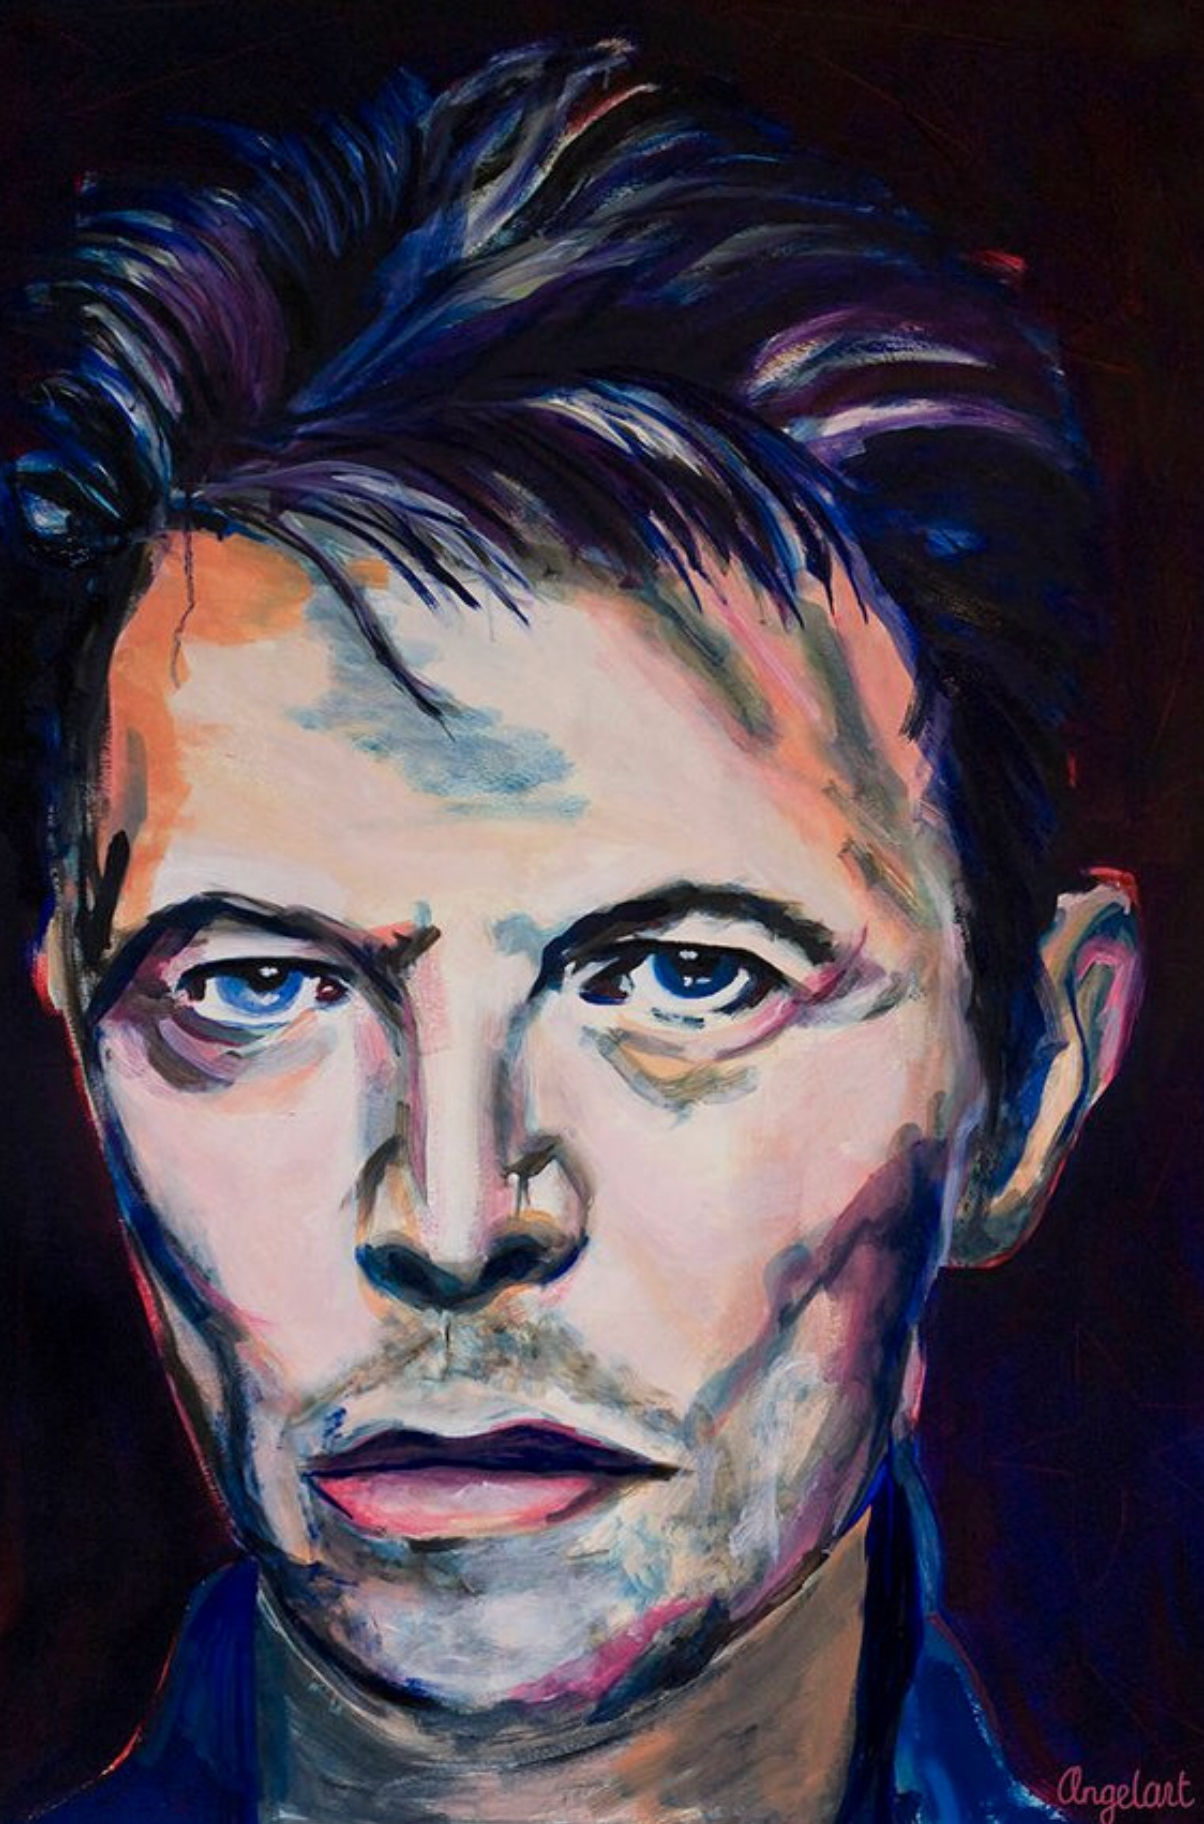 limited edition Giclée Print Herman Brood, prince, David Bowie Angela Peters beeldende kunst